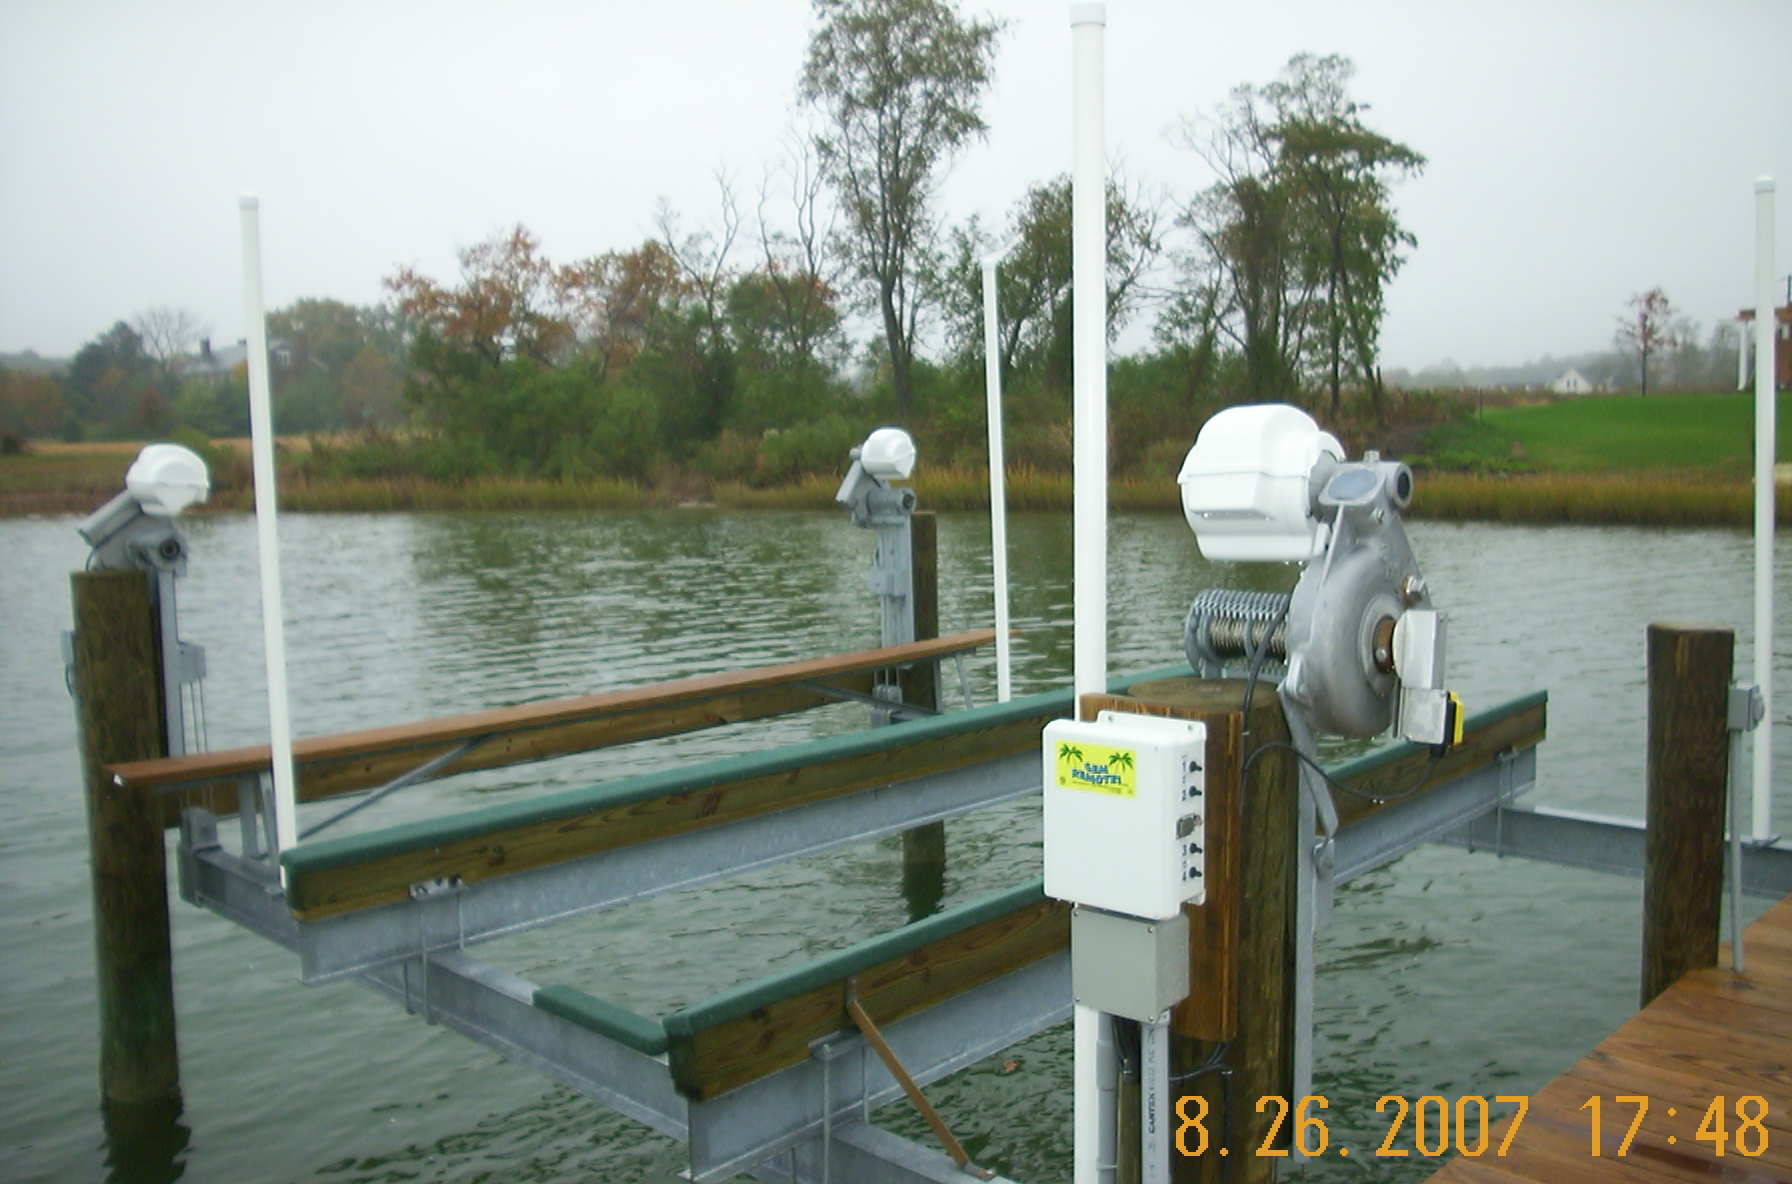 WMC_Boat_Lift-7.jpg